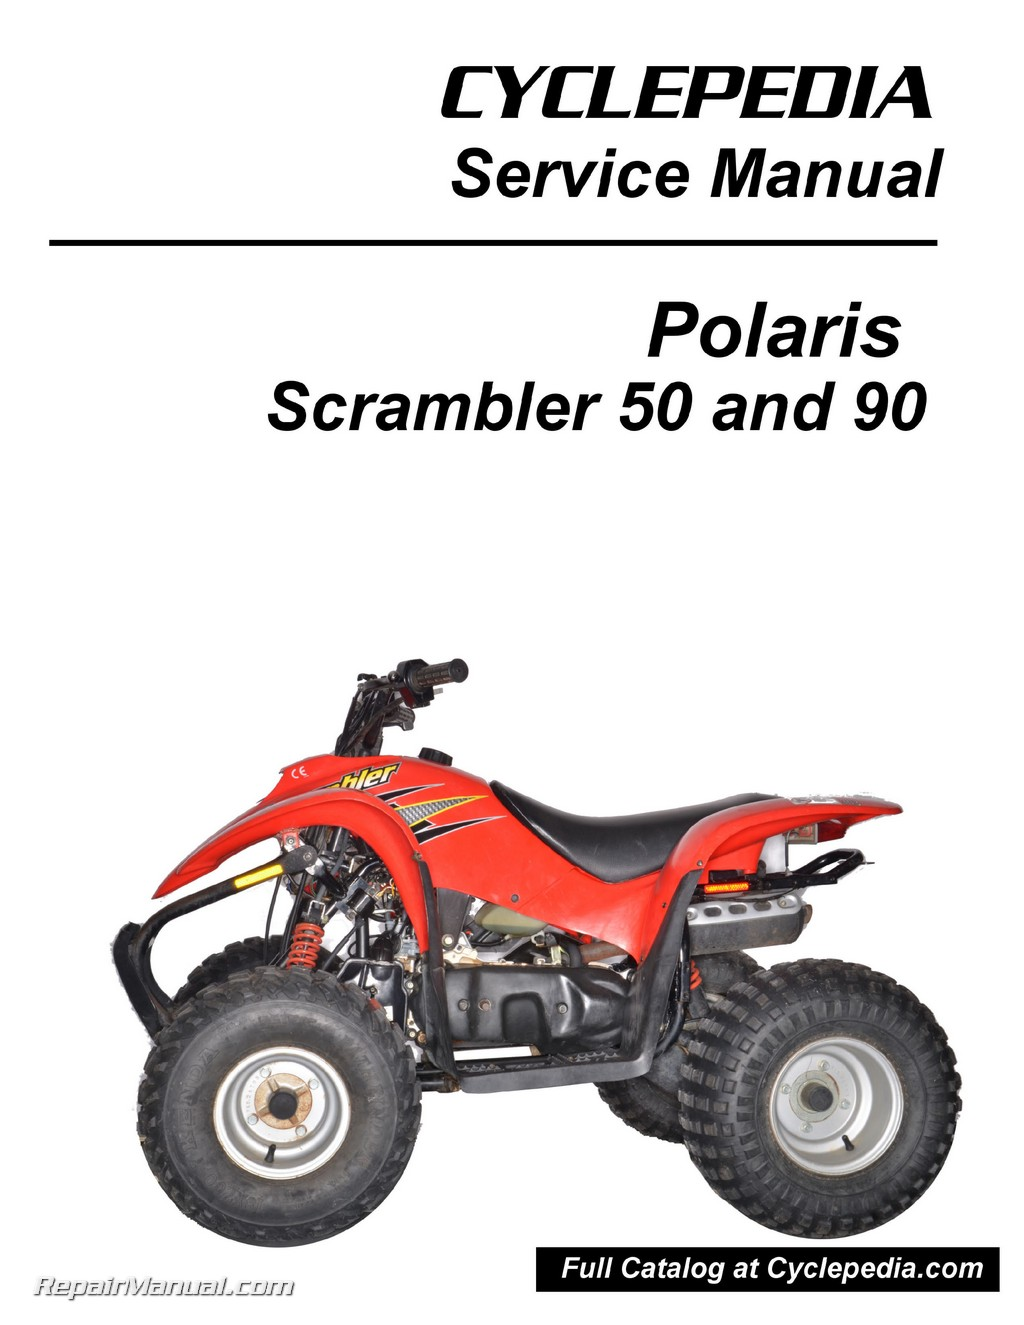 2001 polaris scrambler 50 parts manual motorjdi co rh motorjdi co polaris atv parts catalog polaris atv parts list